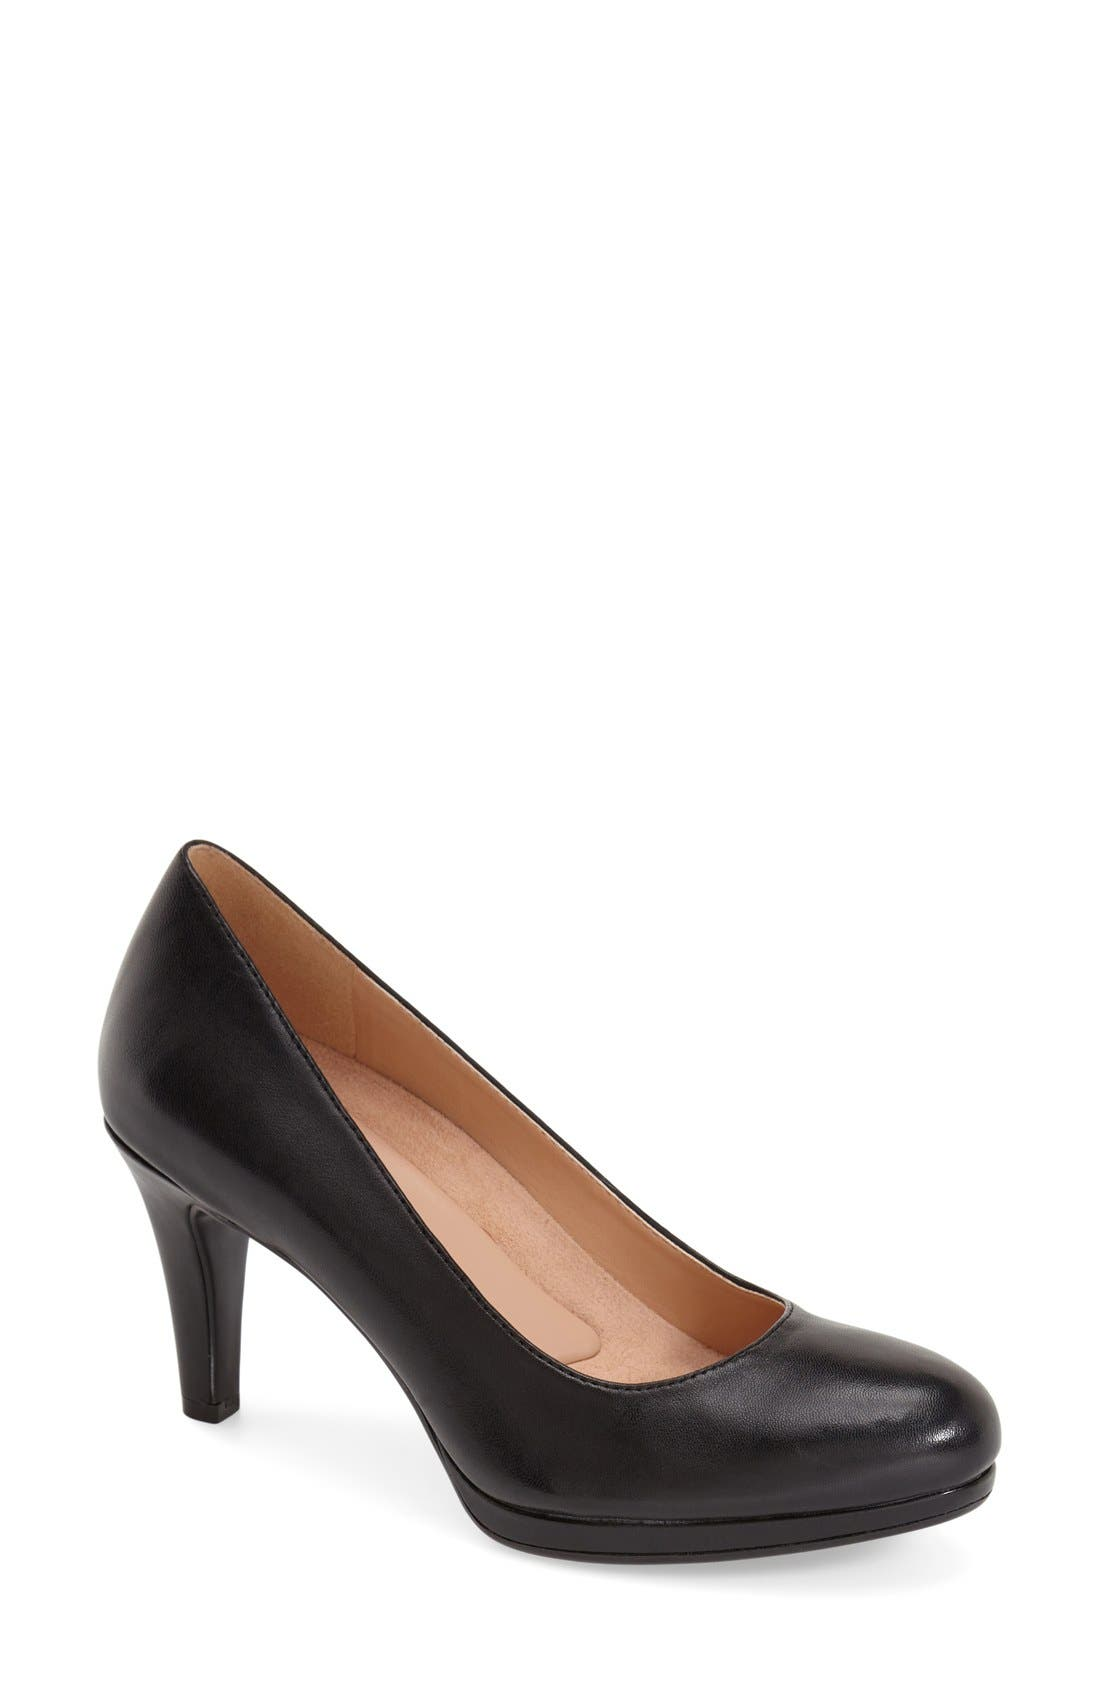 'Michelle' Almond Toe Pump,                         Main,                         color, BLACK LEATHER